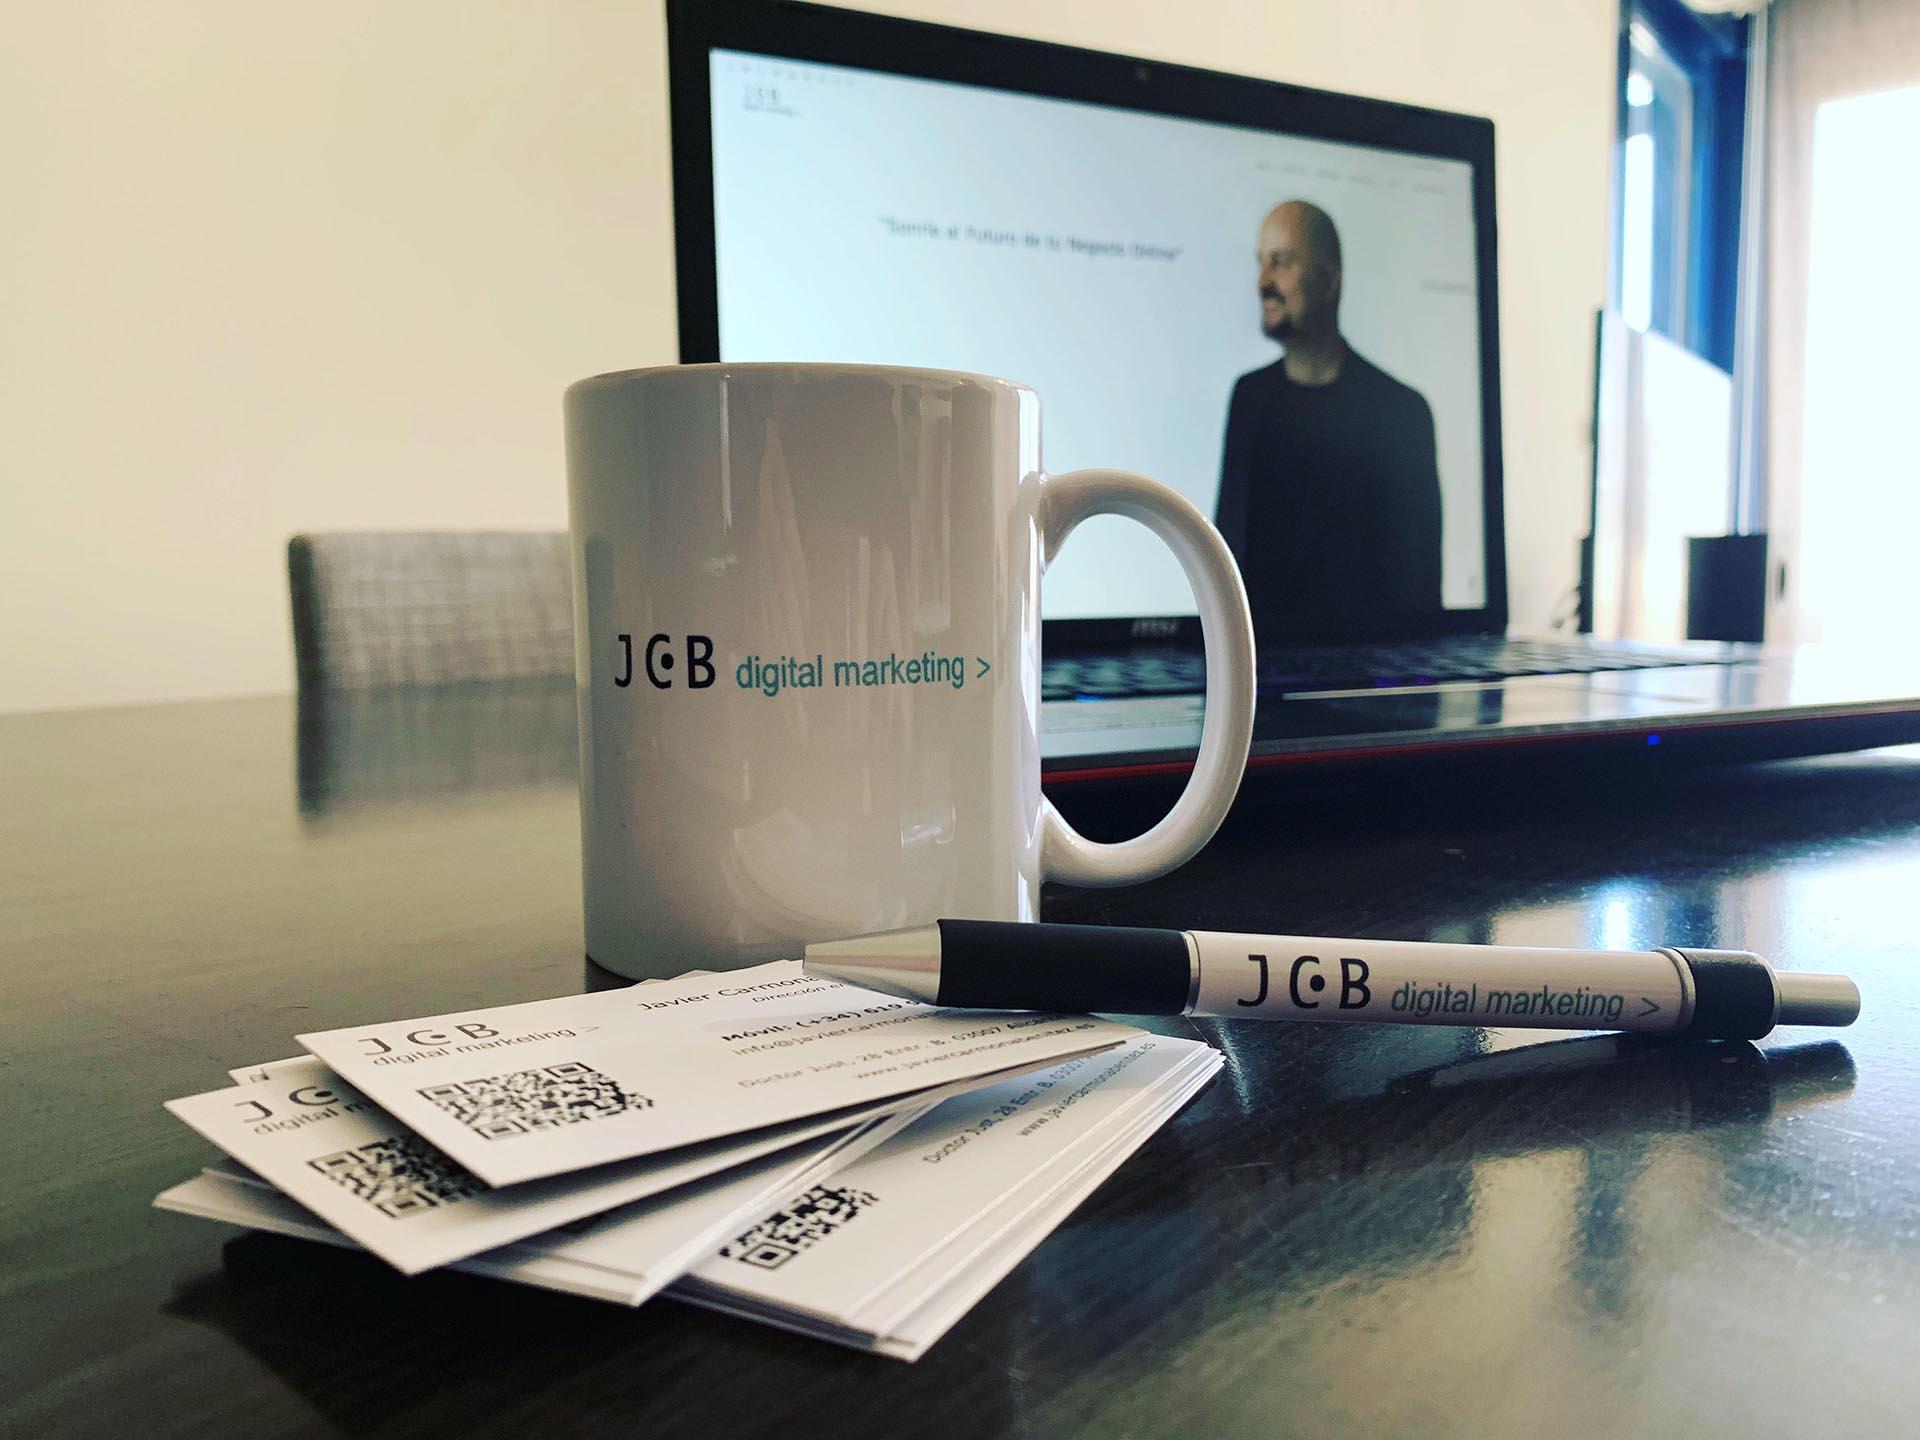 digital marketing brand 2019 - google business